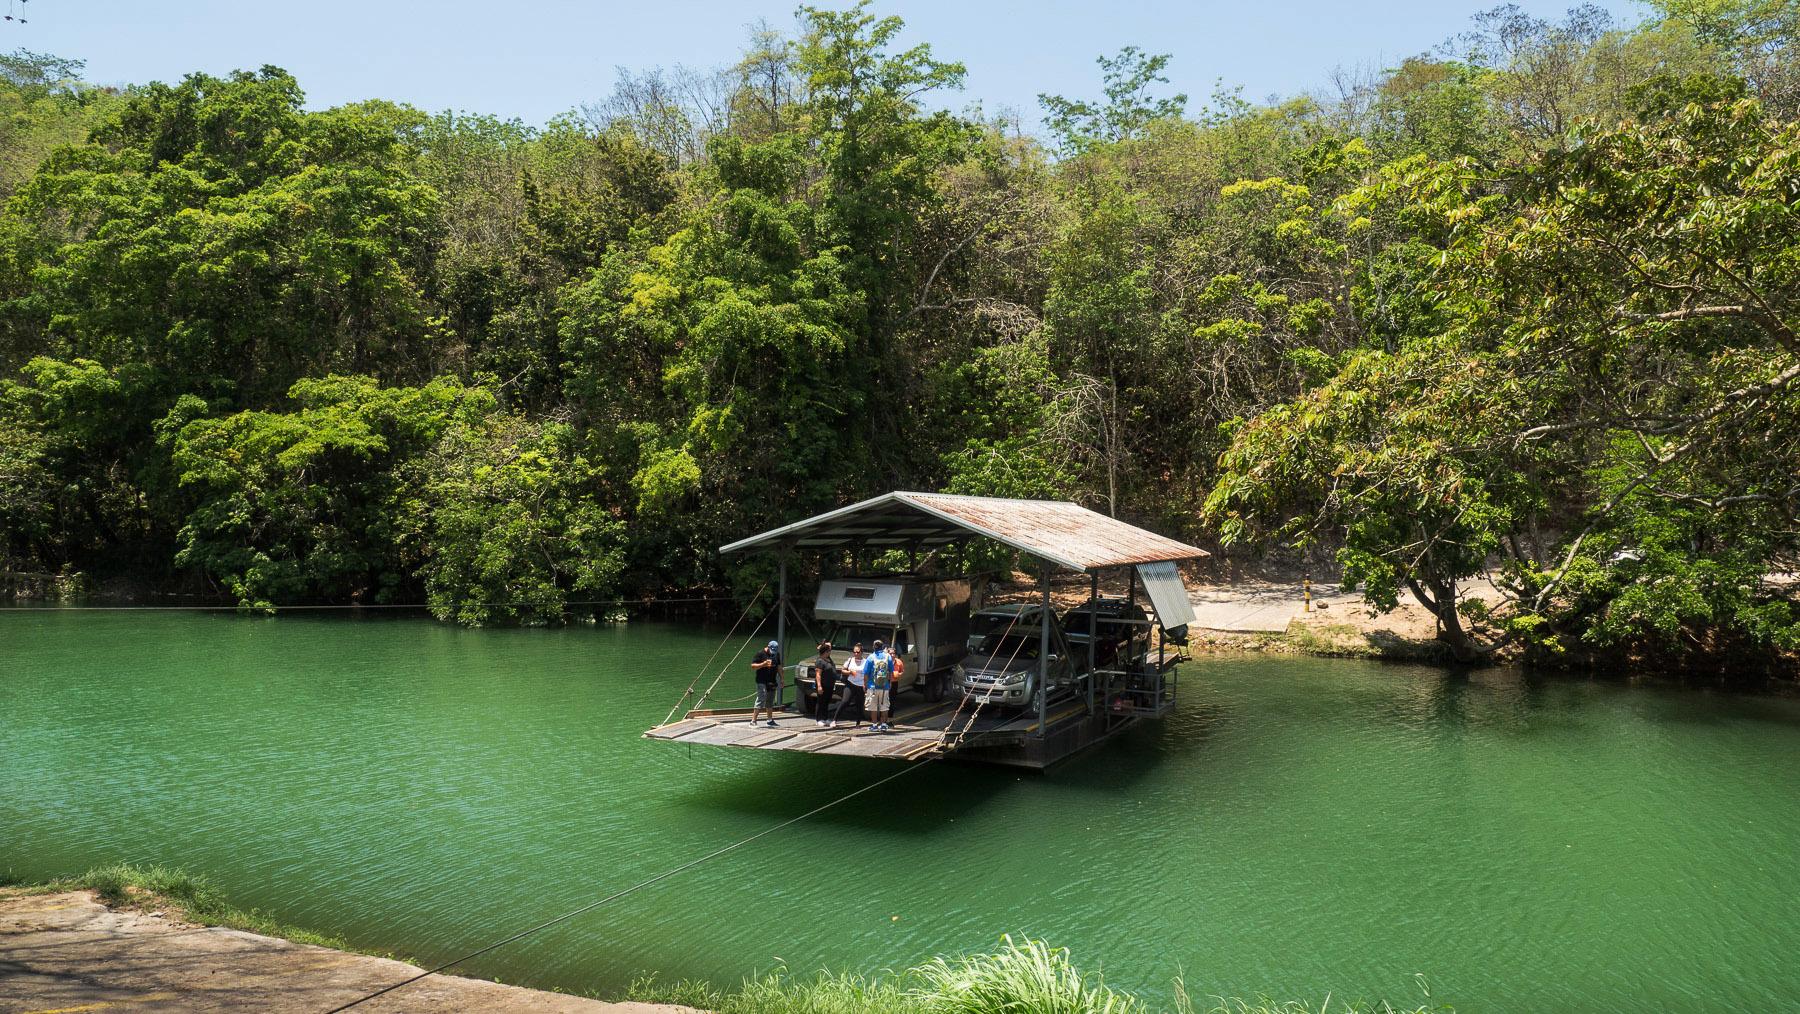 Good Bye Belize, mir hat's gut gefallen